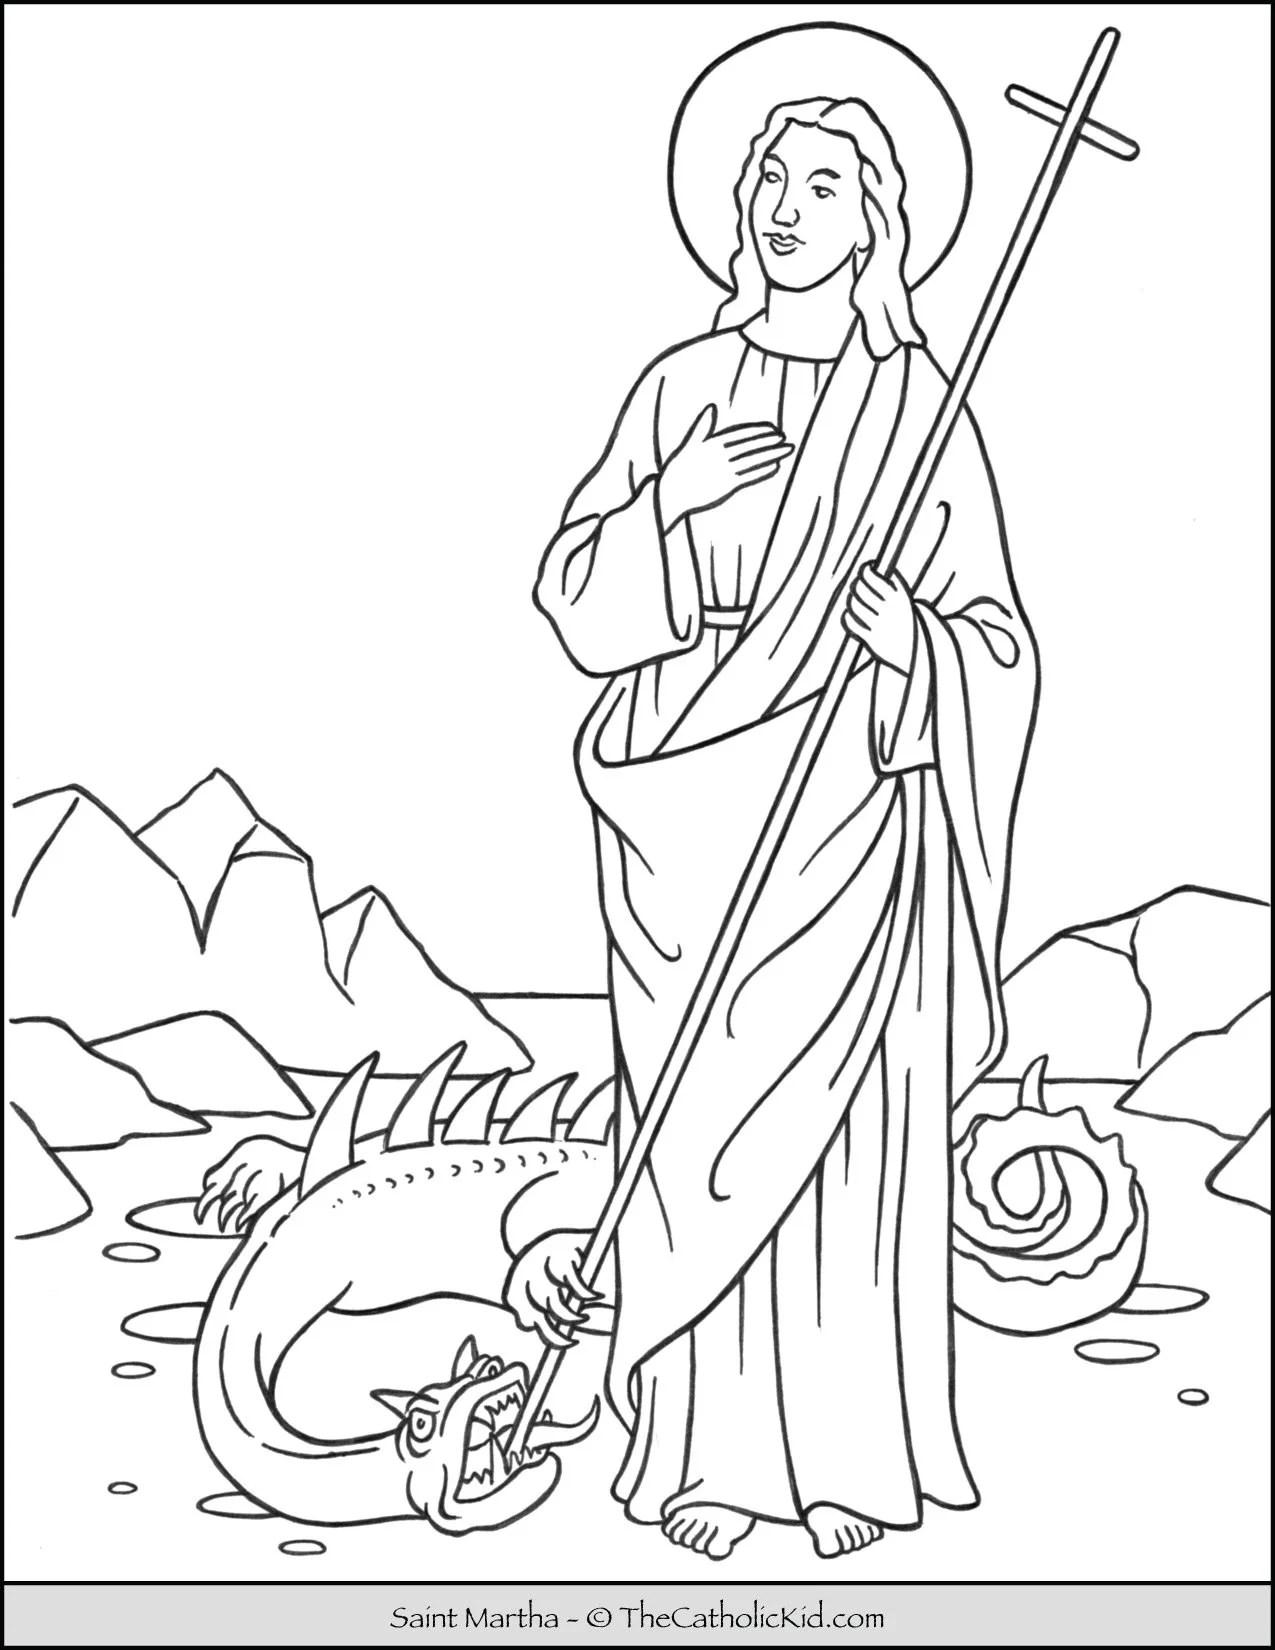 Saint Martha Coloring Page